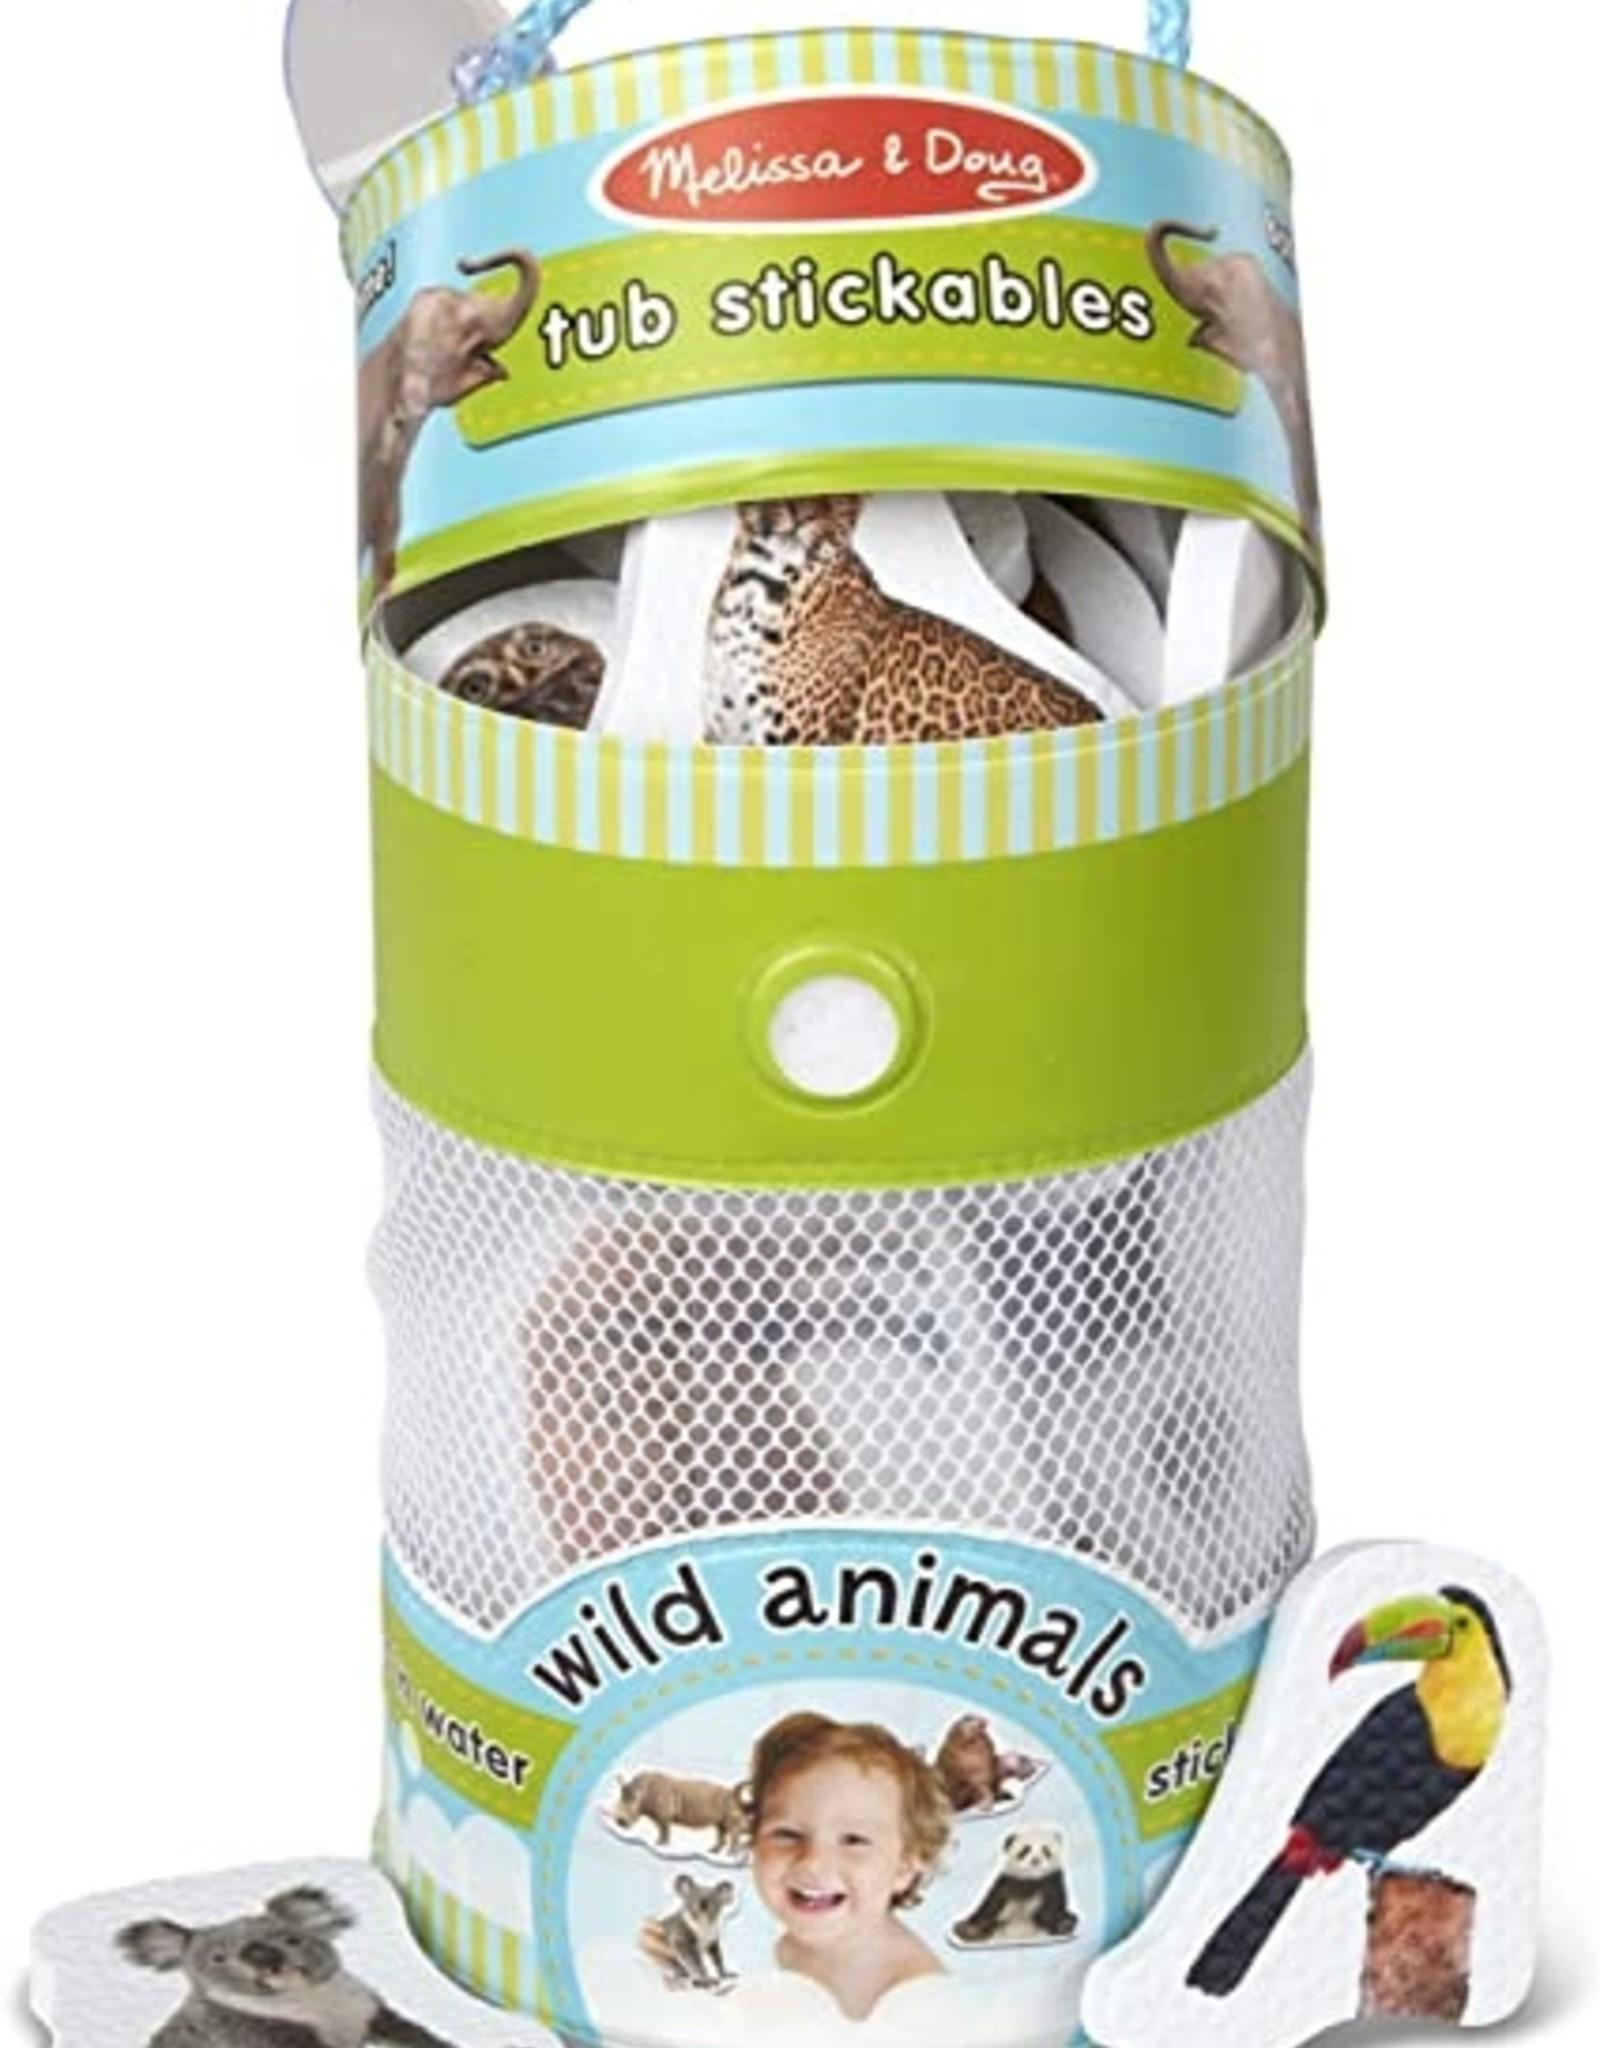 Melissa & Doug Tub Stickables - WIld Animals